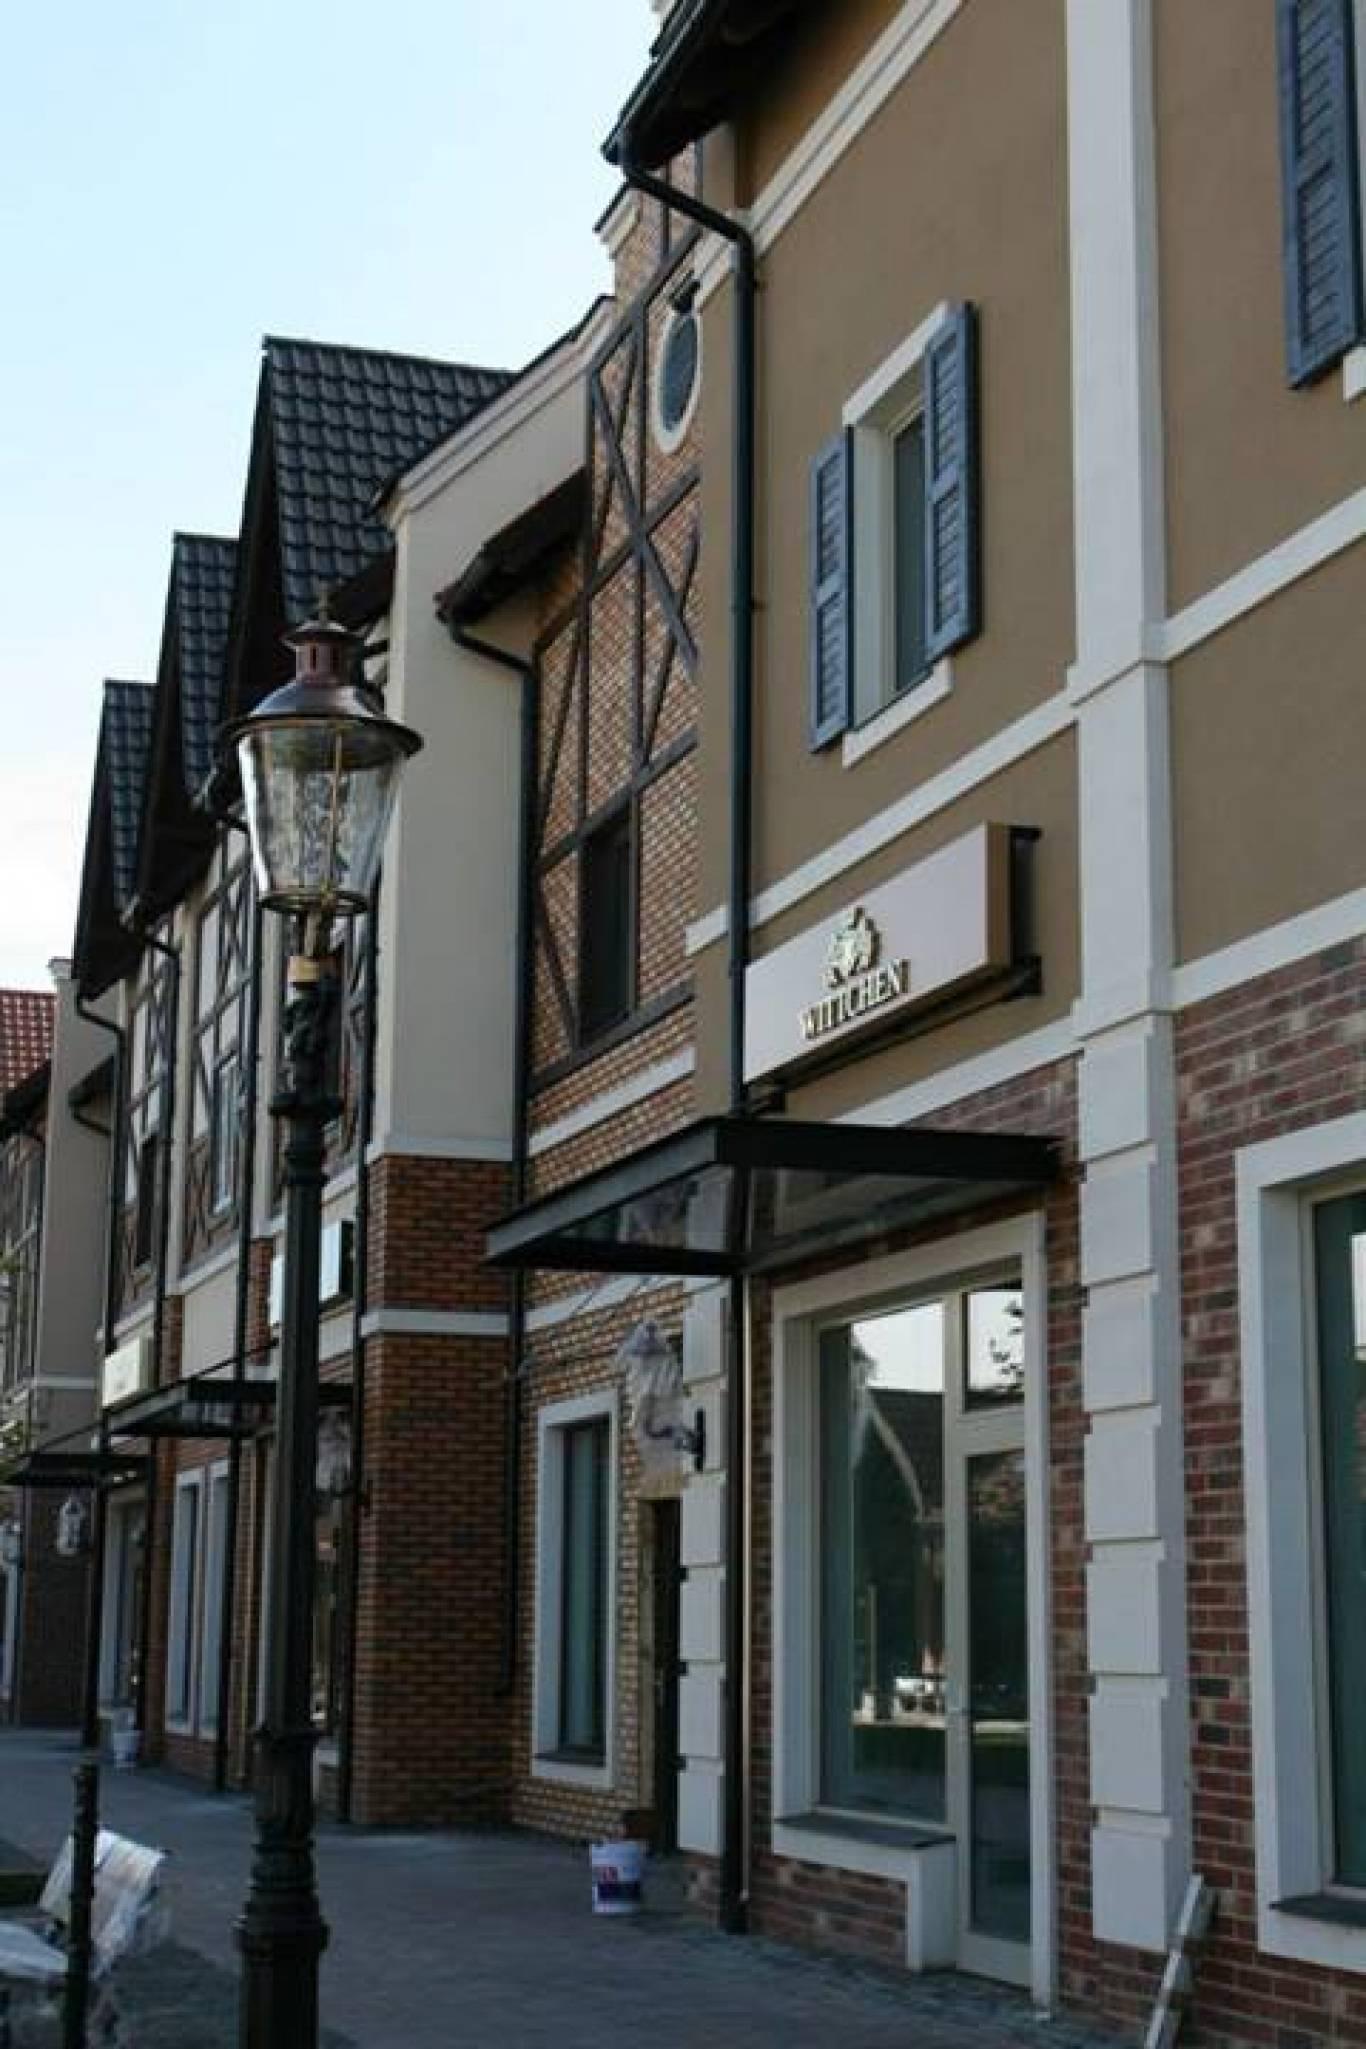 Голандський уік-енд в аутлет-містечку «Мануфактура»